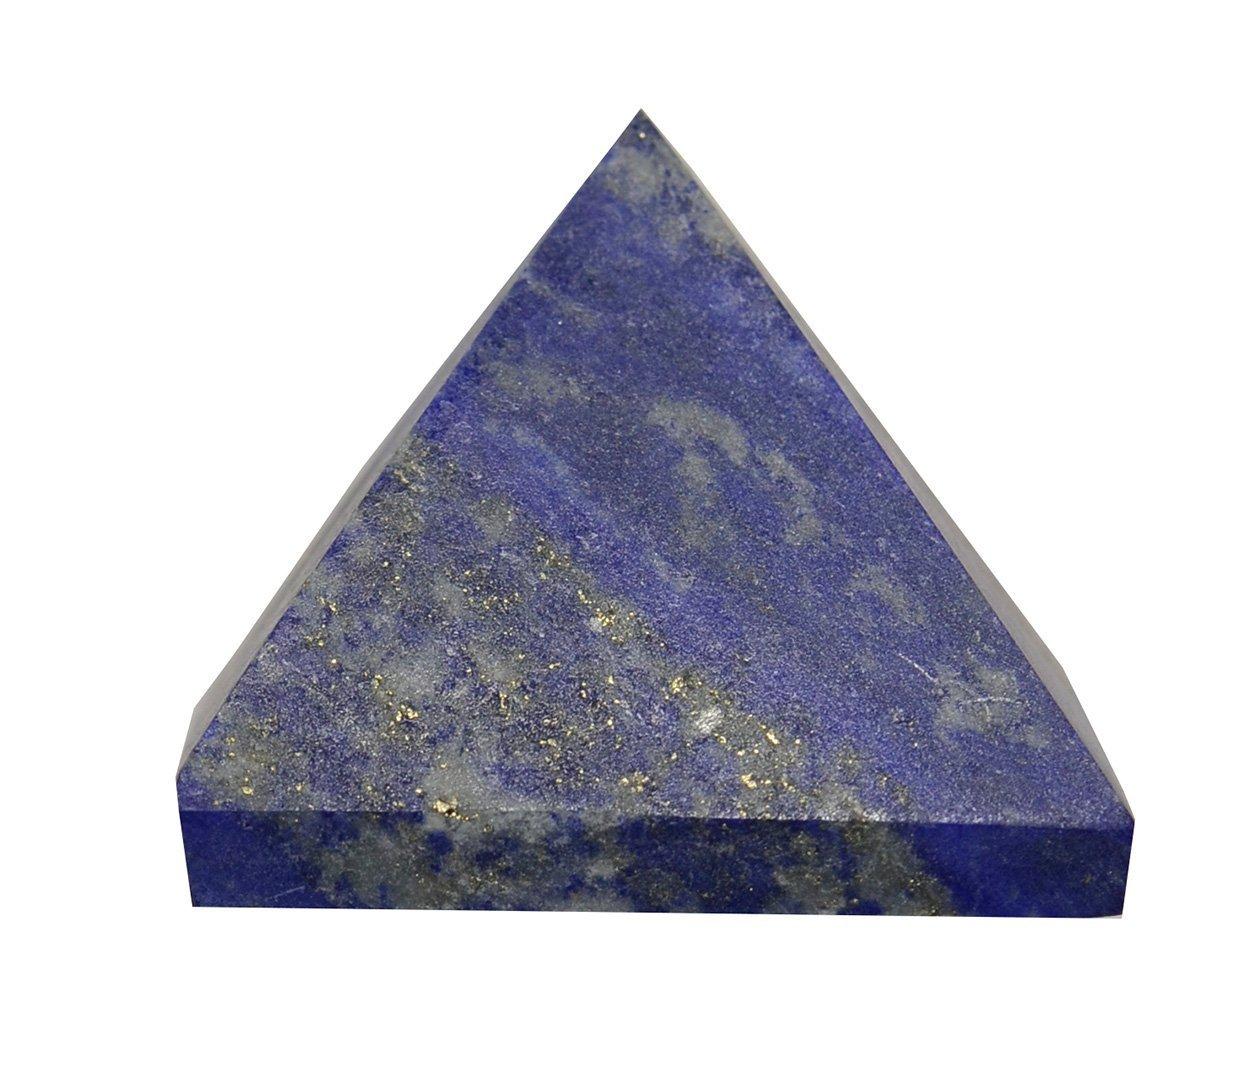 Lapis Lazuli Gemstone Pyramid (3/4'' - 1'') - 1pc w/ Metaphysical Info Card